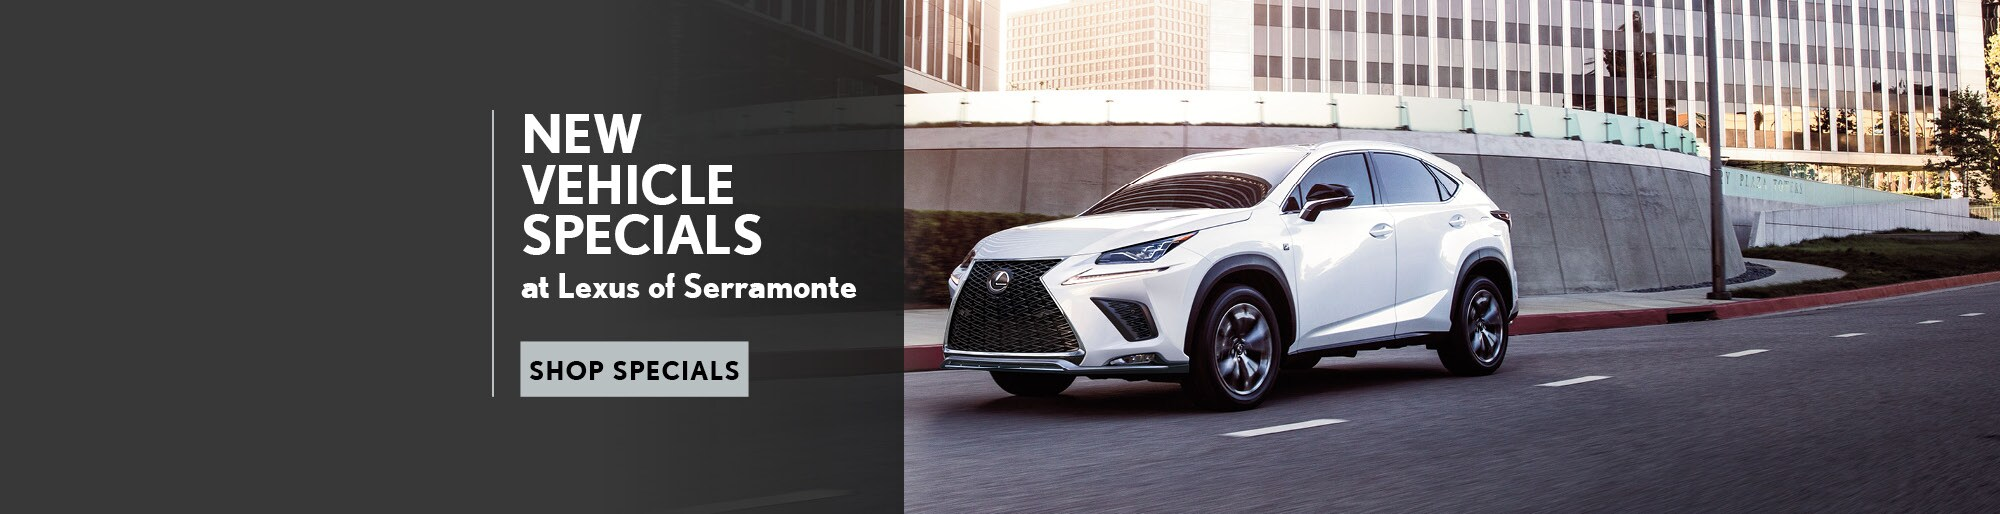 Dealer Daily Lexus >> Lexus Of Serramonte New Lexus Dealership In Colma Ca